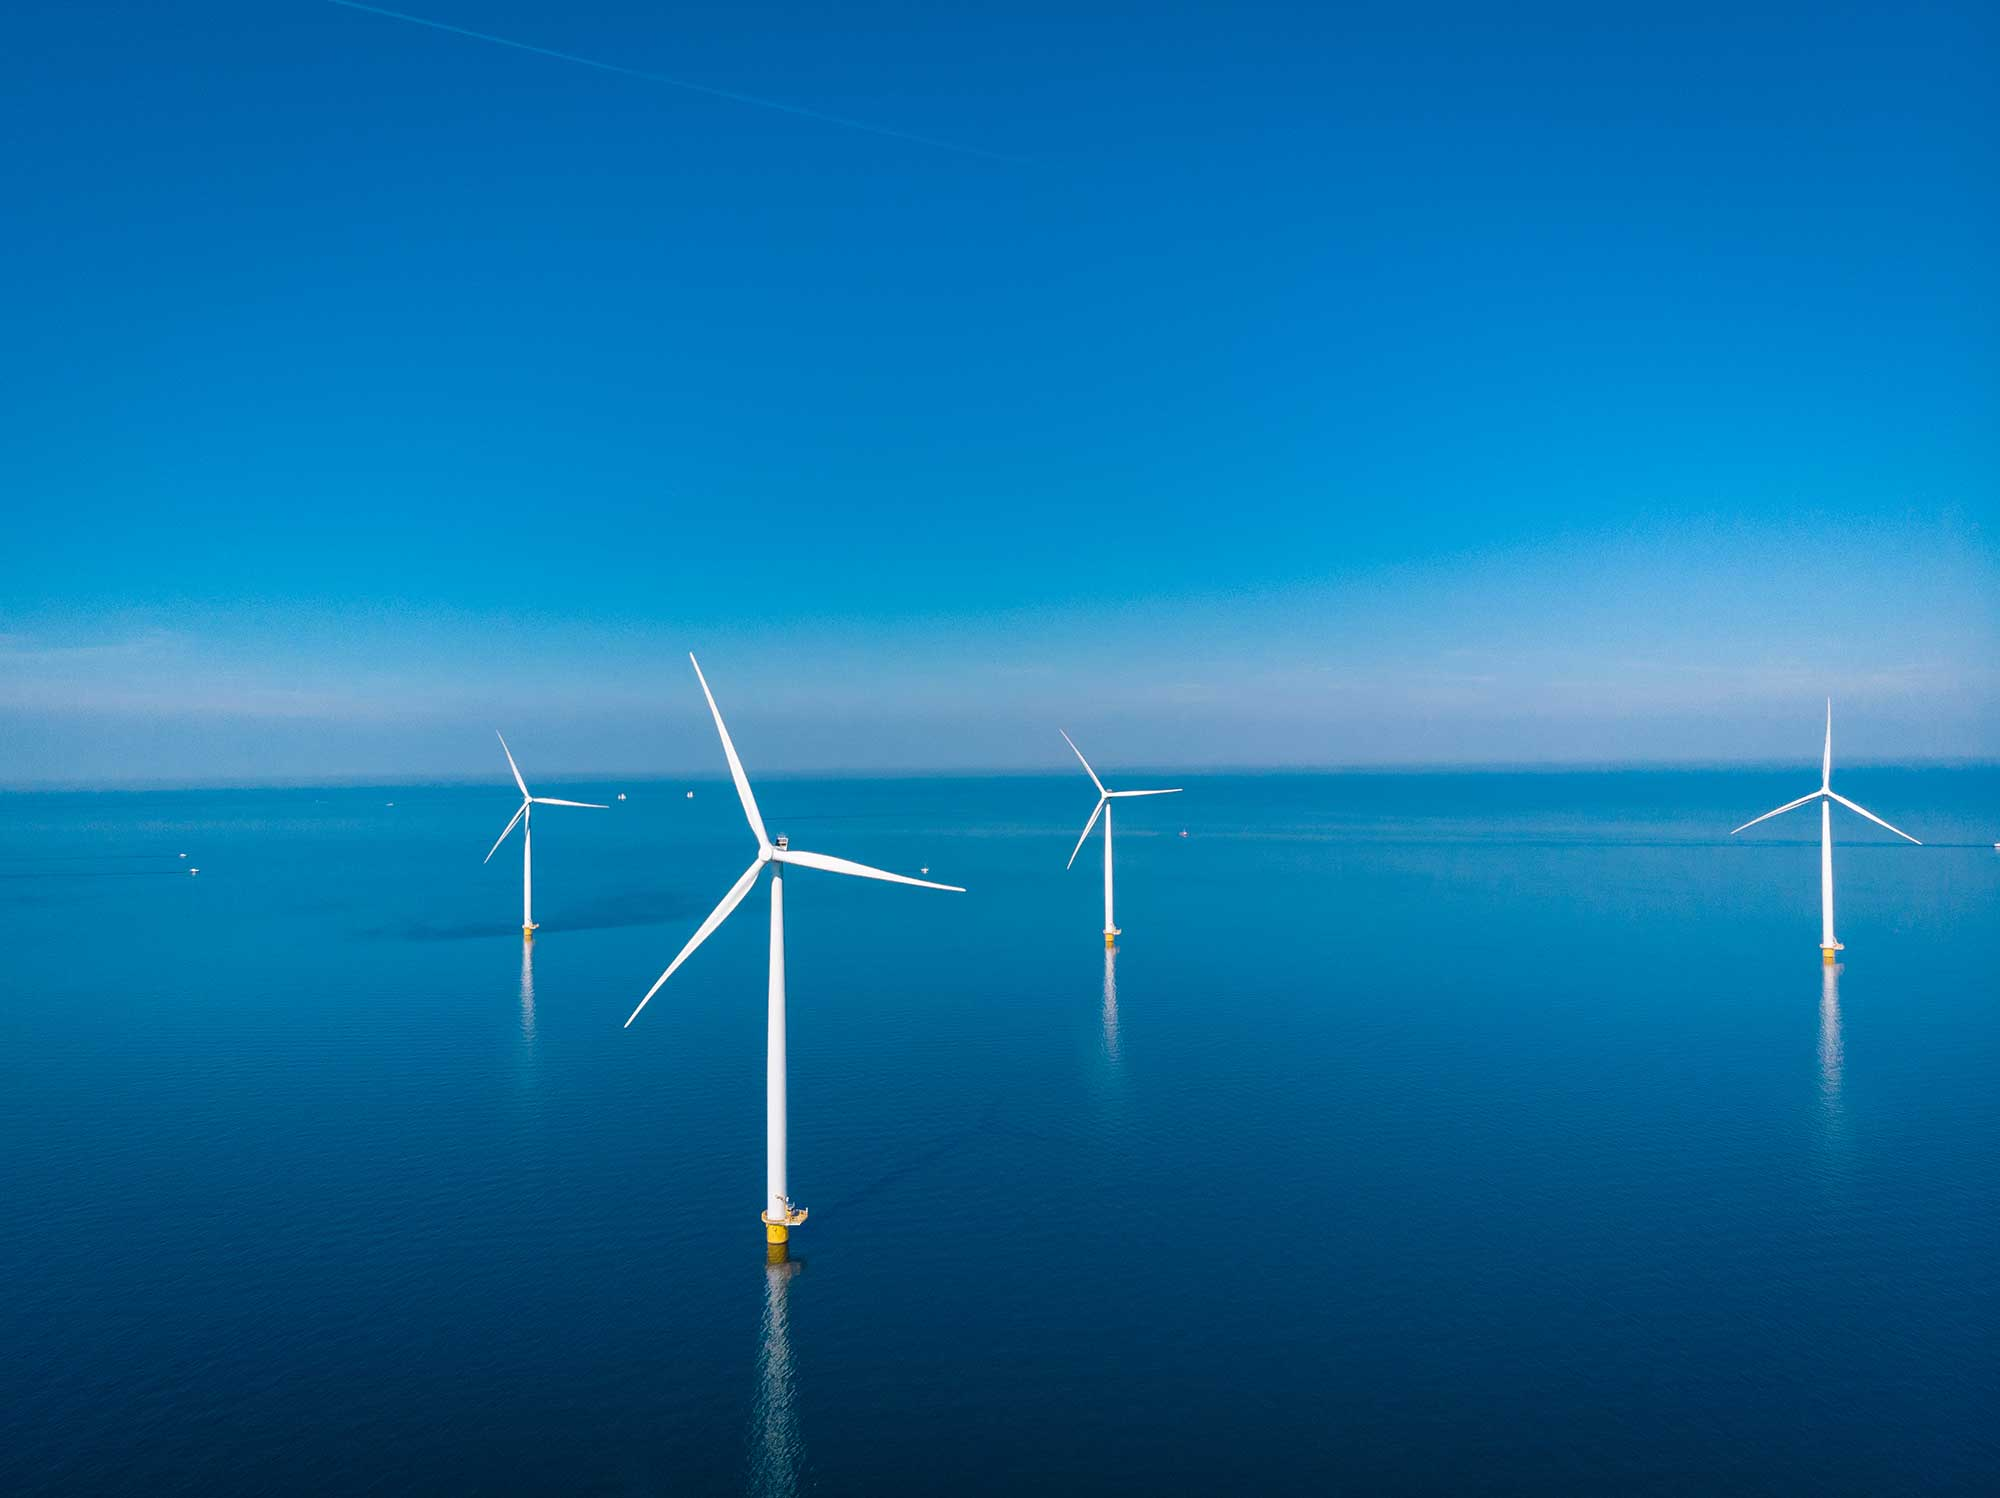 Westermeerwind windmolenpark op zee